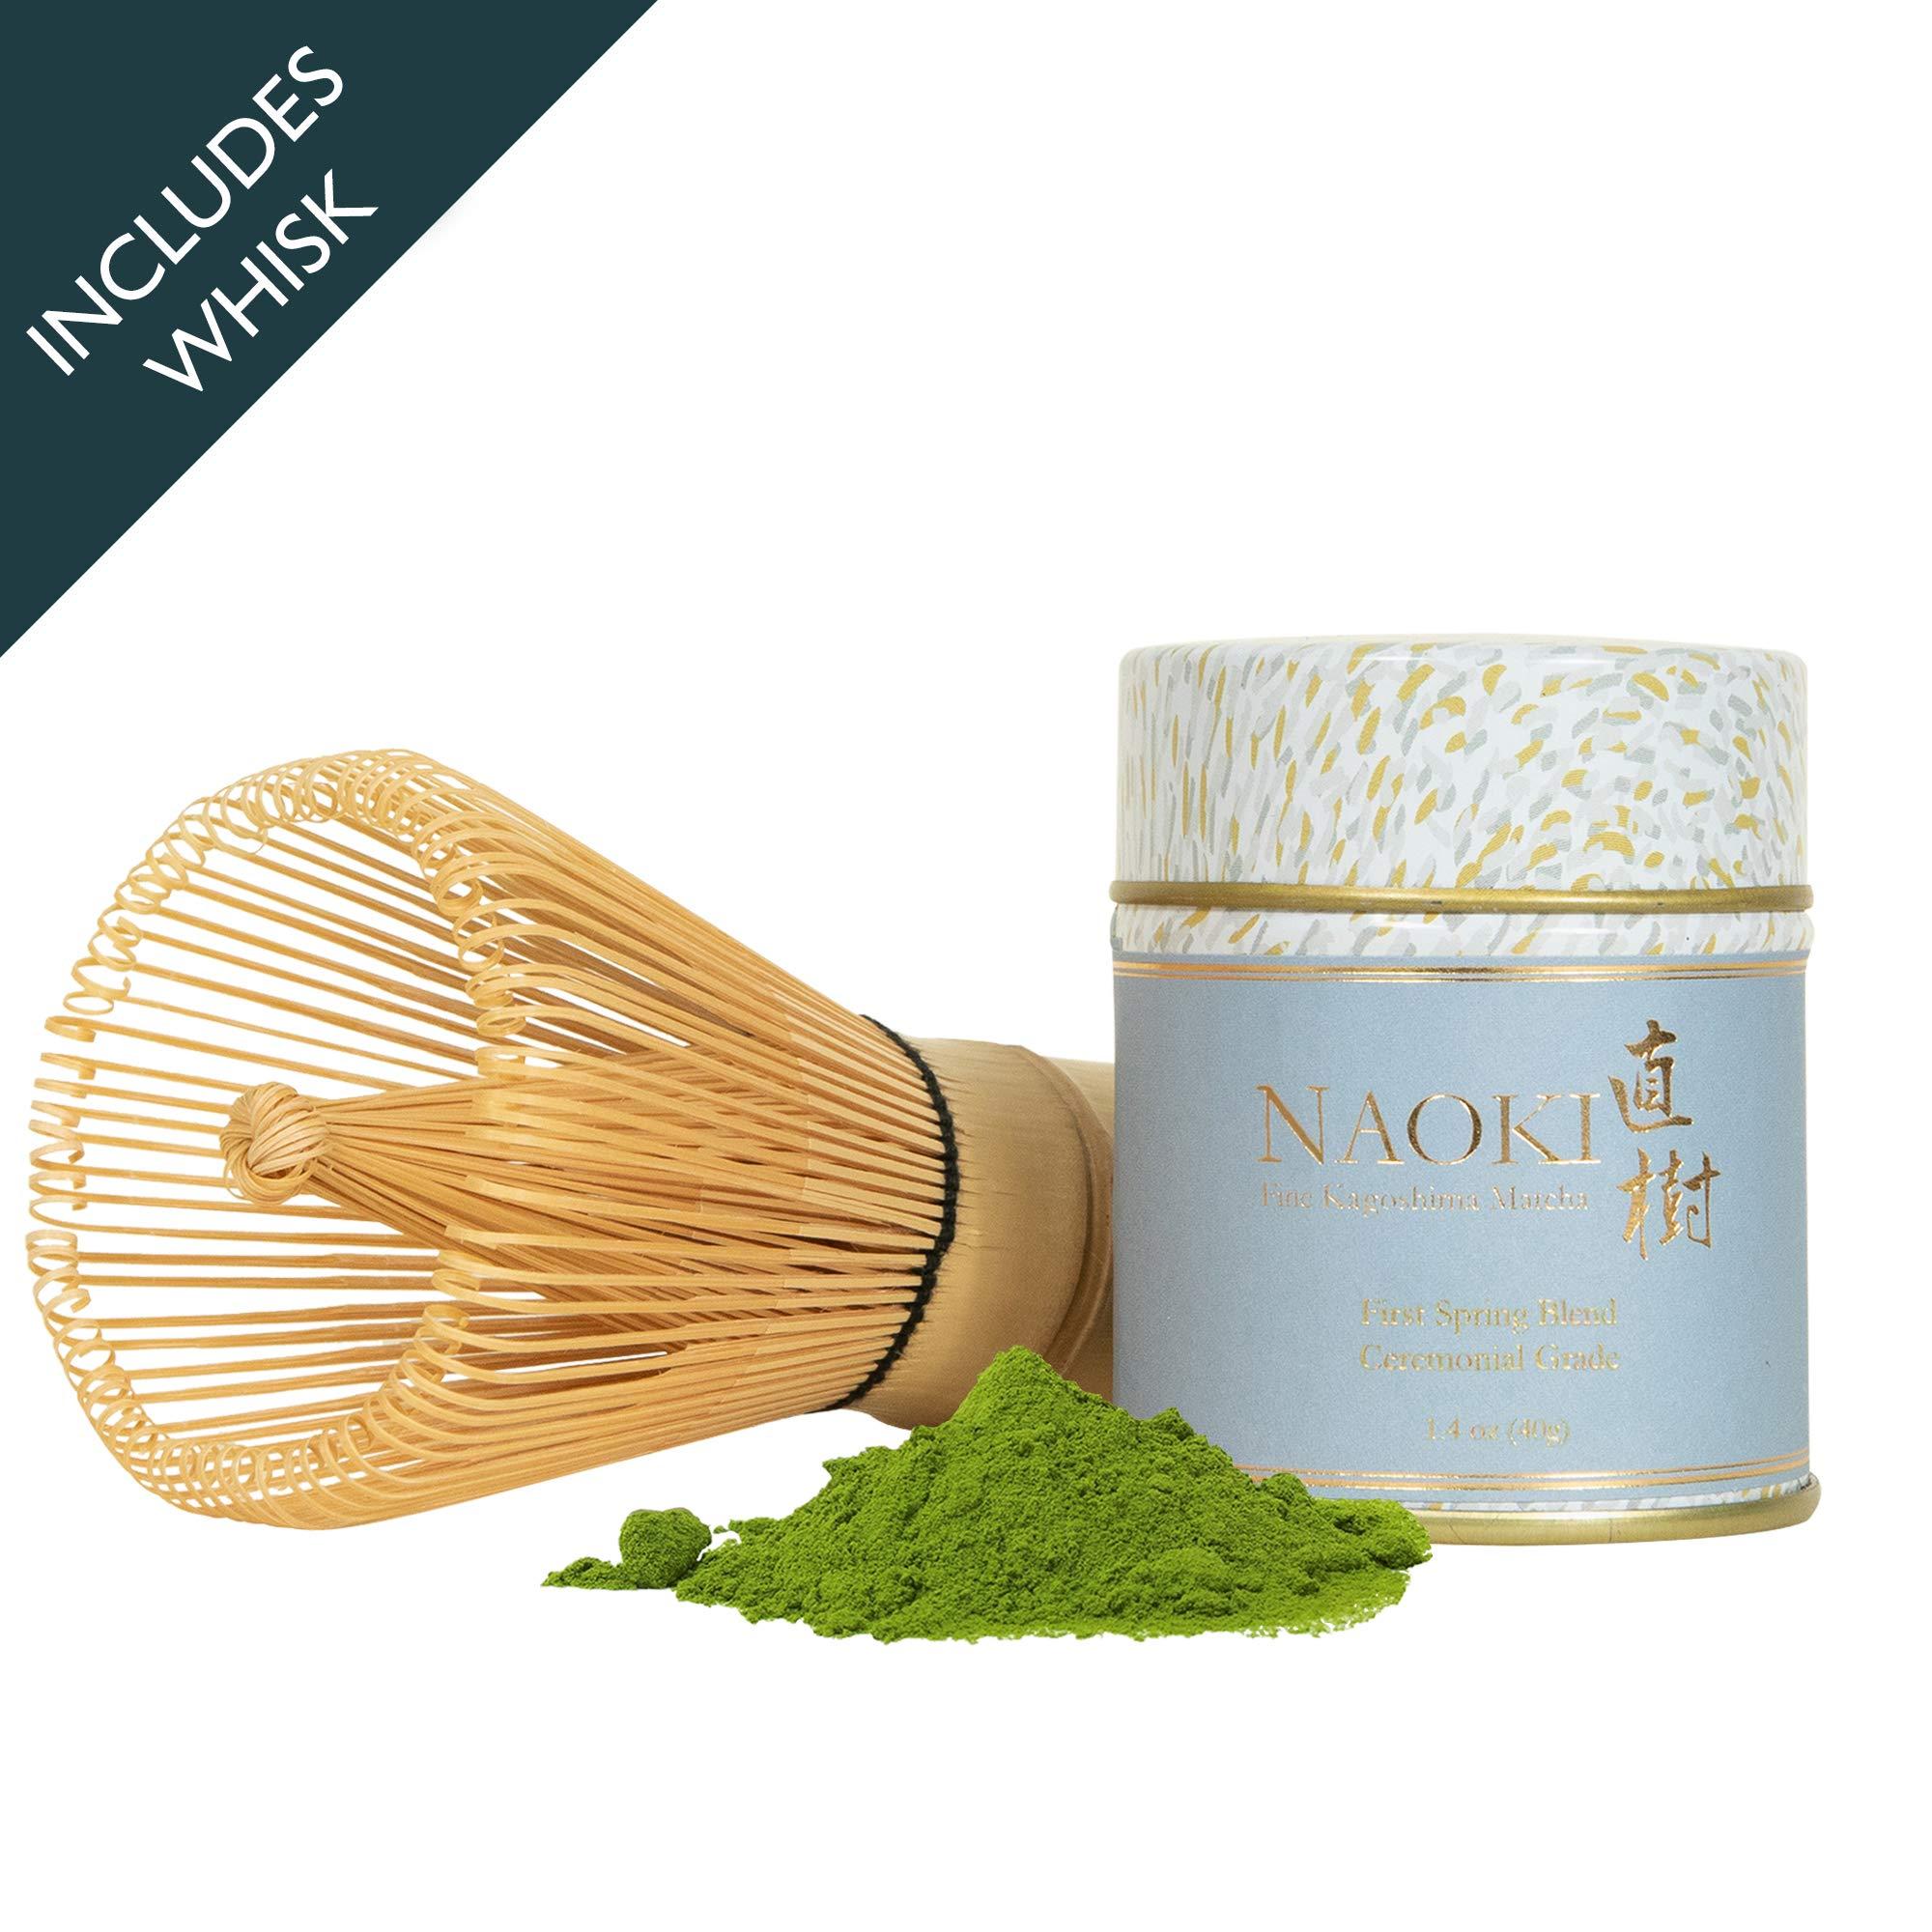 Naoki Matcha Matcha Set Traditional Bamboo Whisk (Chasen) with Authentic Japanese Matcha Green Tea Powder (First Spring Blend 1.4 oz/40g) Ceremonial Grade from Kagoshima, Japan by Naoki Matcha